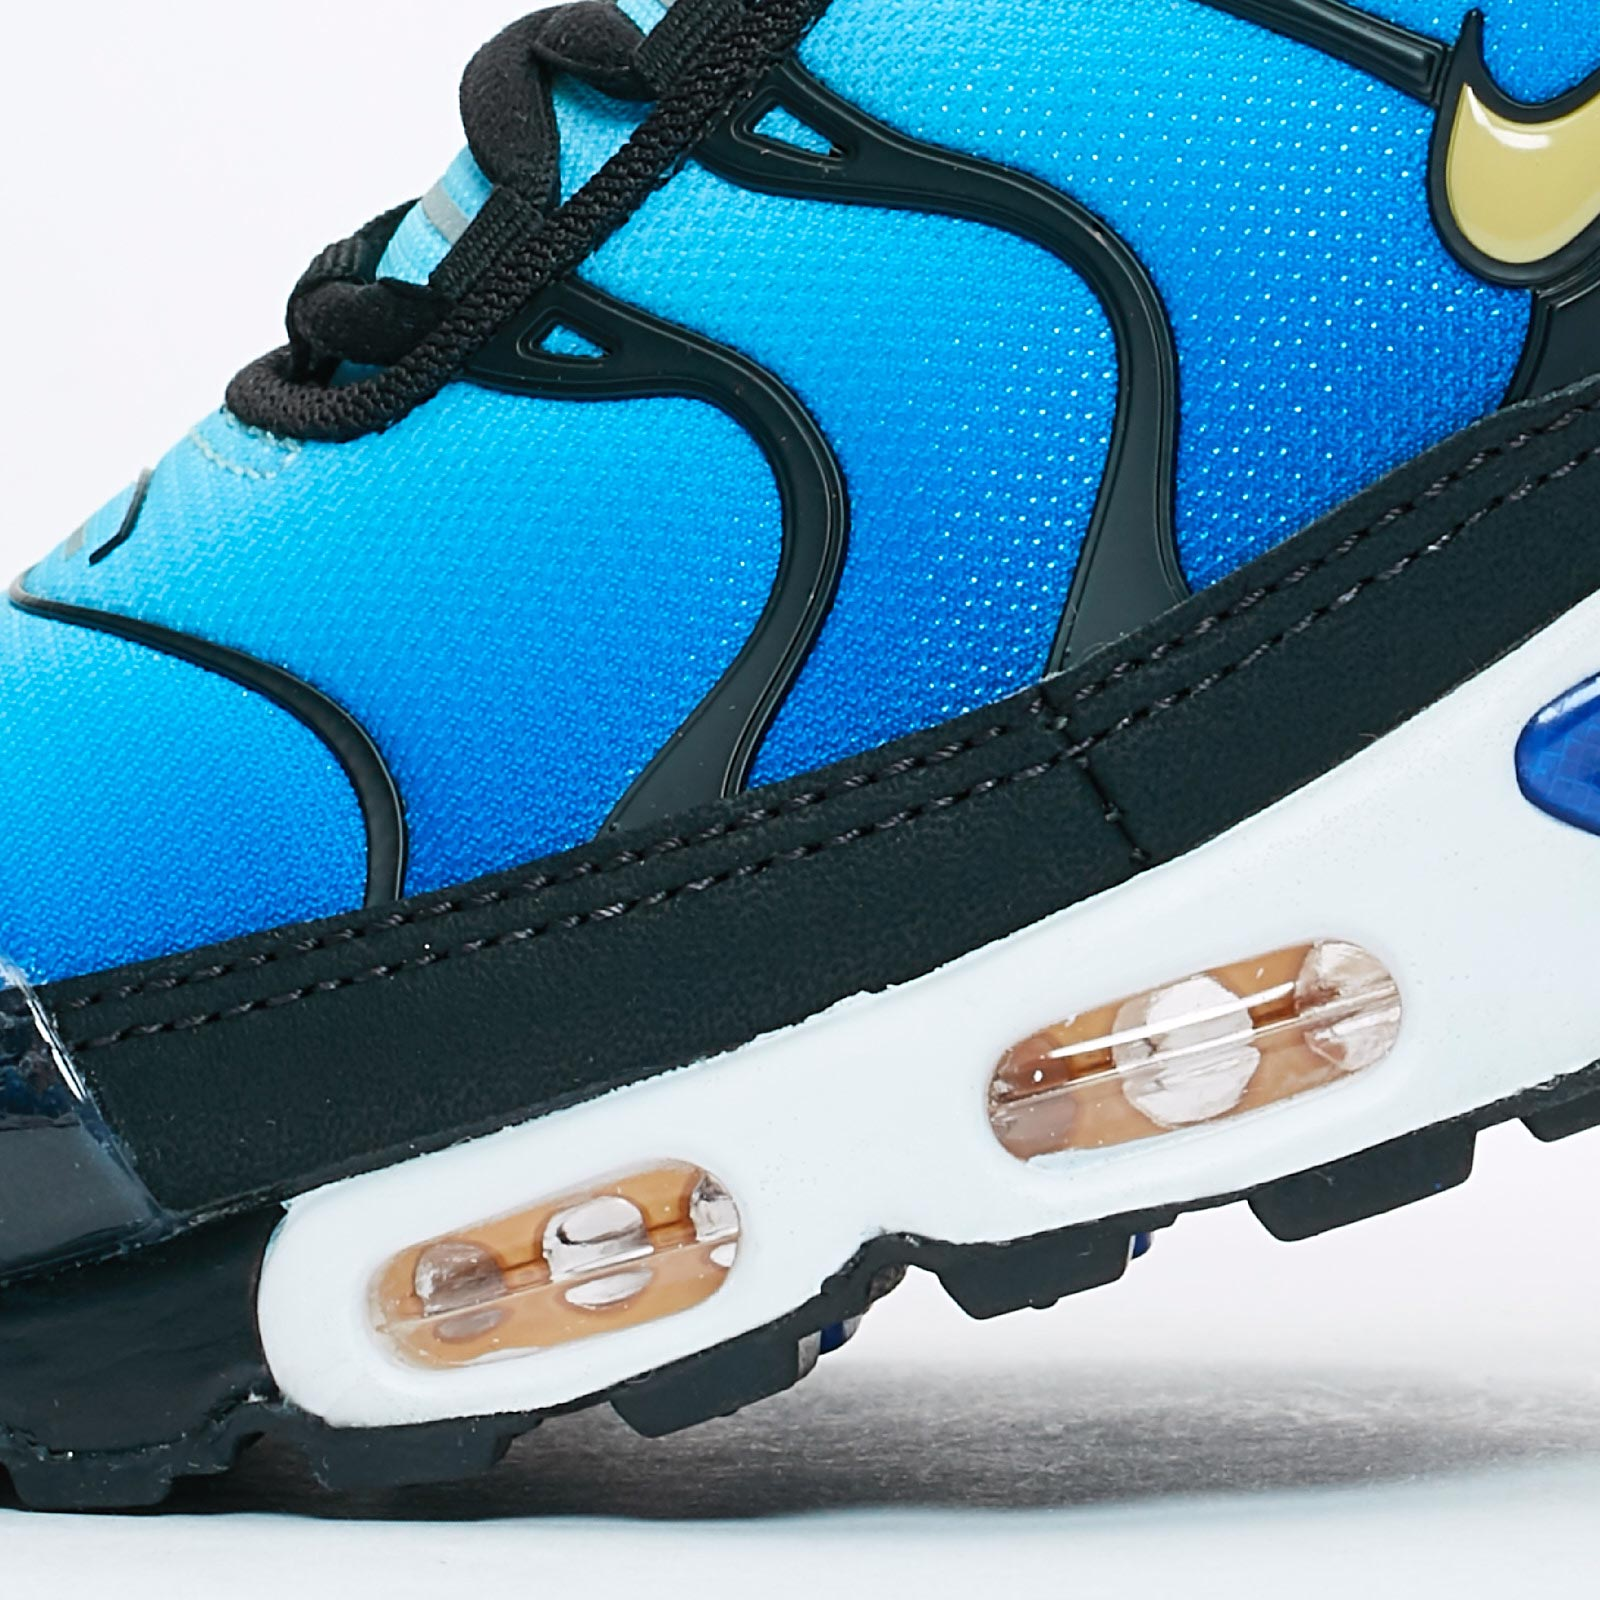 size 40 e13aa 41d9a Nike Sportswear Air Max Plus OG - 8. Close